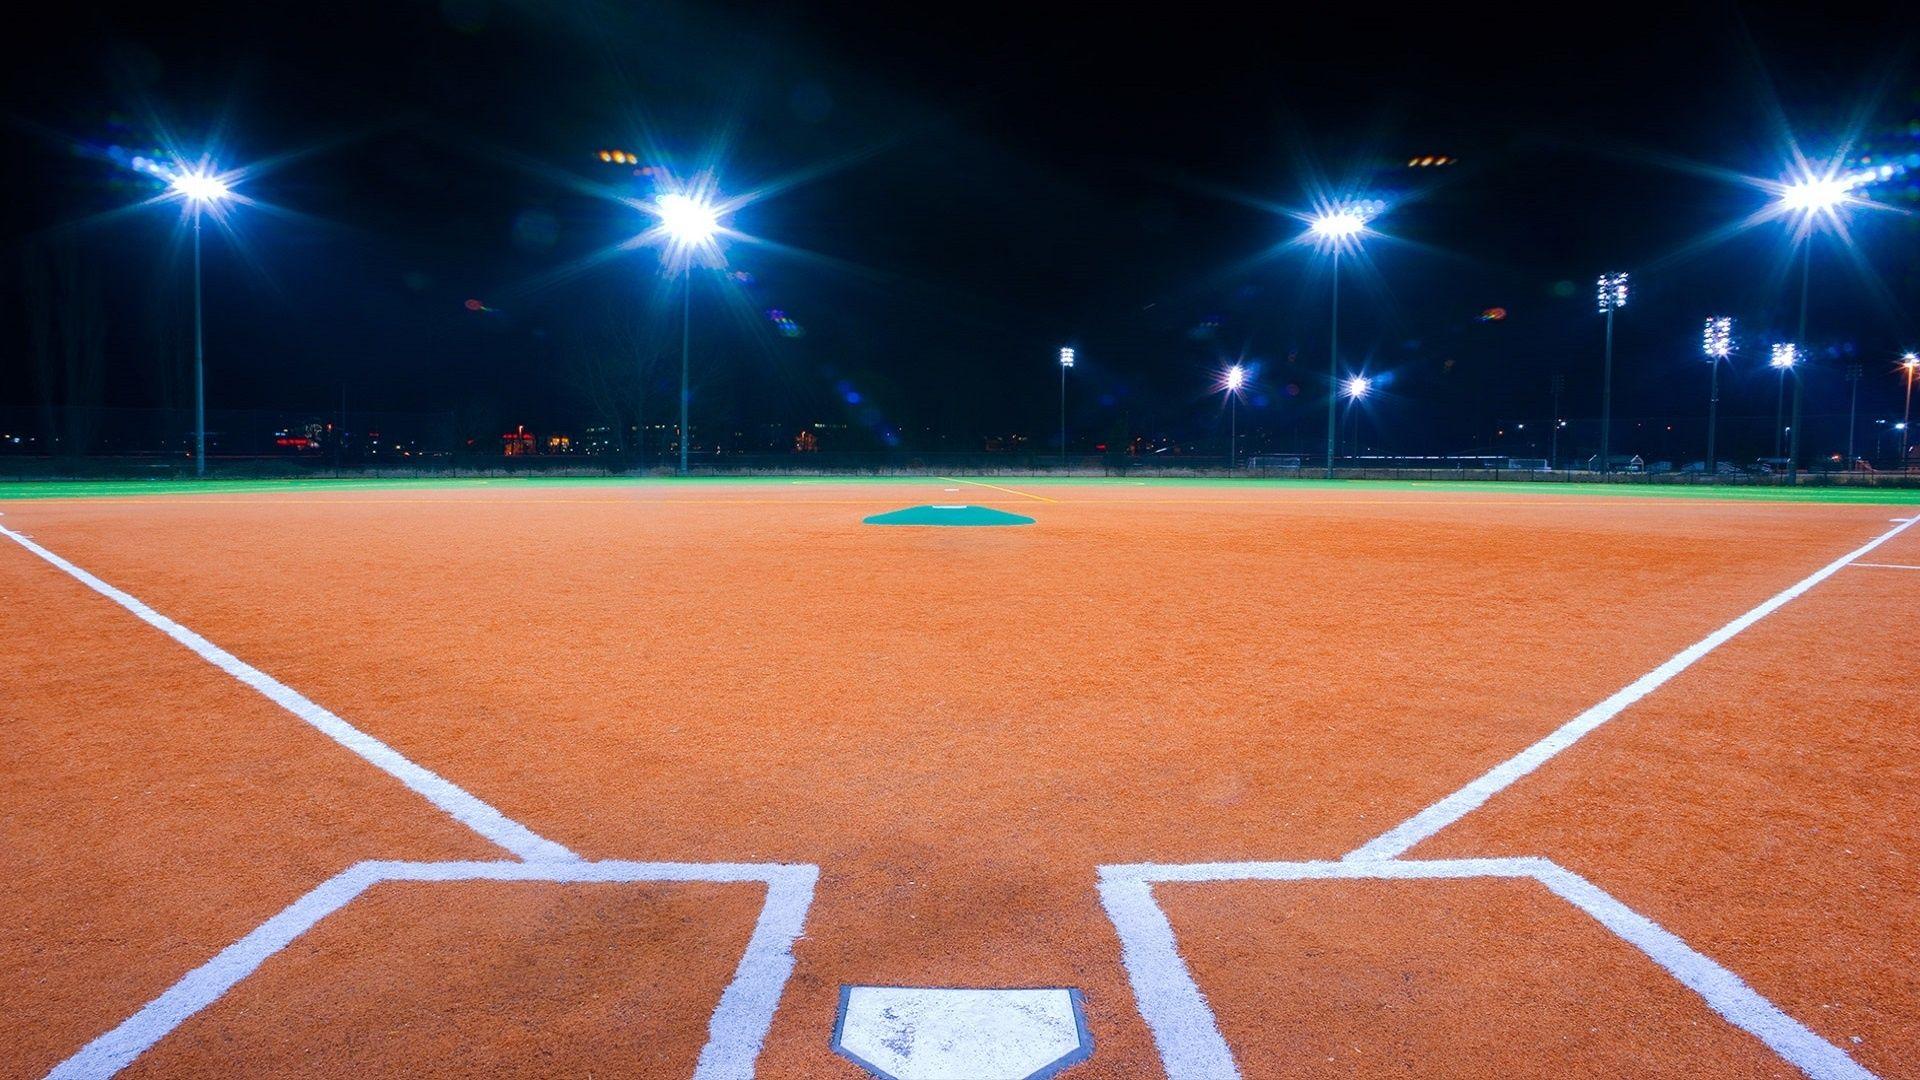 X Baseball Stadium Lighting Night